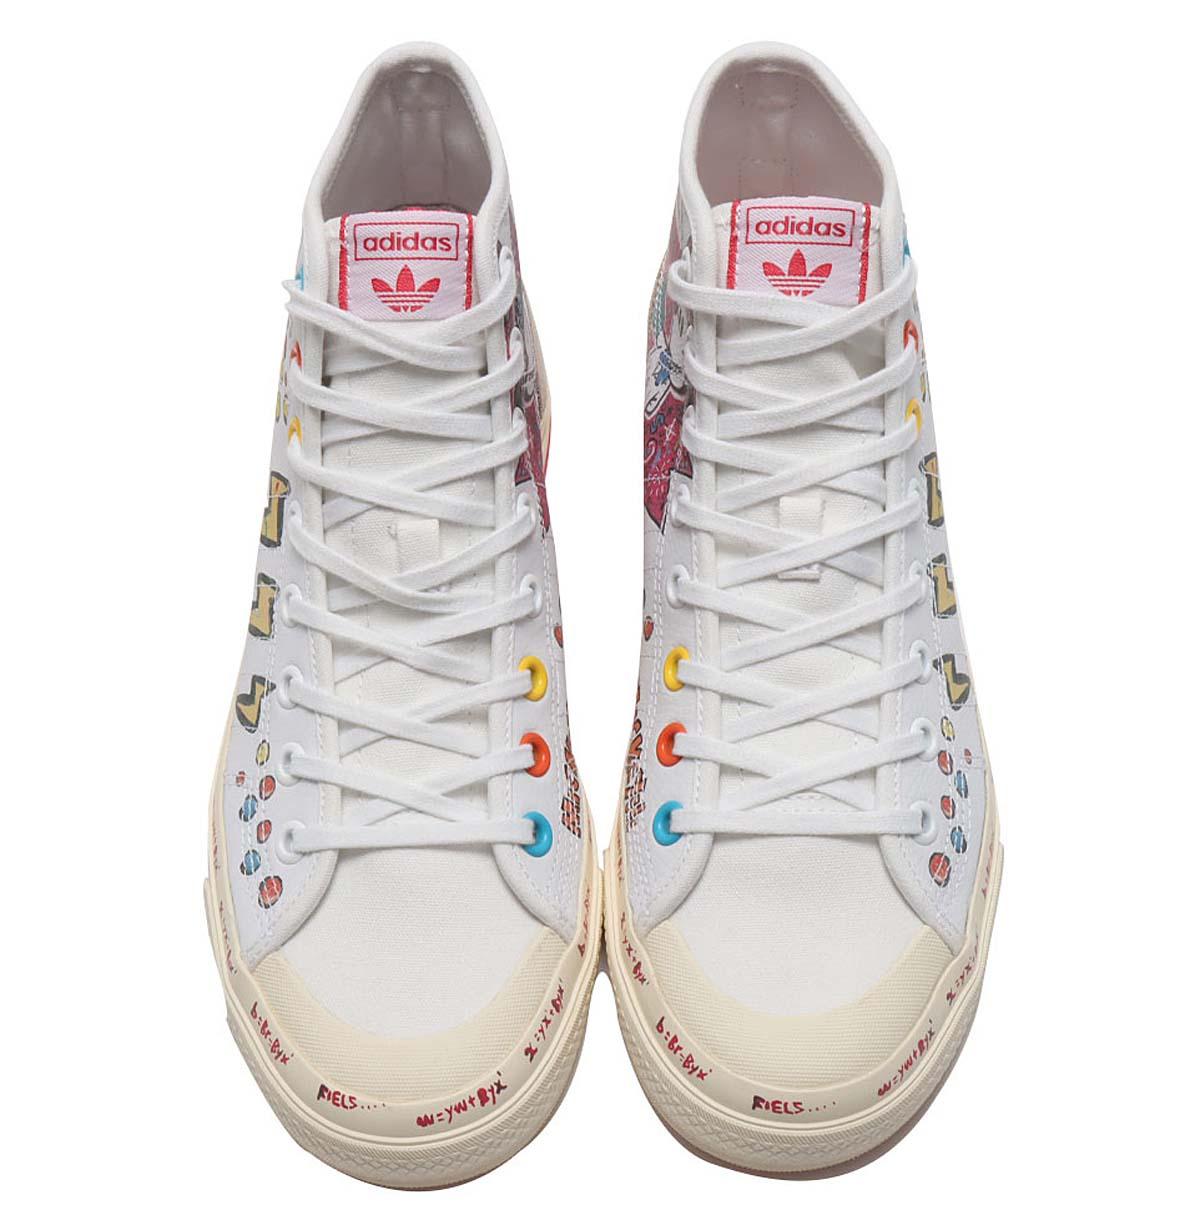 adidas NIZZA HI RF Kasing Lung x Mickey Mouse x adidas Mickey Twist FOOTWEAR WHITE / FOOTWEAR WHITE / WONDER GLOW GZ8838 アディダス ニッザ ハイ RF カシン・ローン / ミッキーマウス ホワイト/マルチカラー